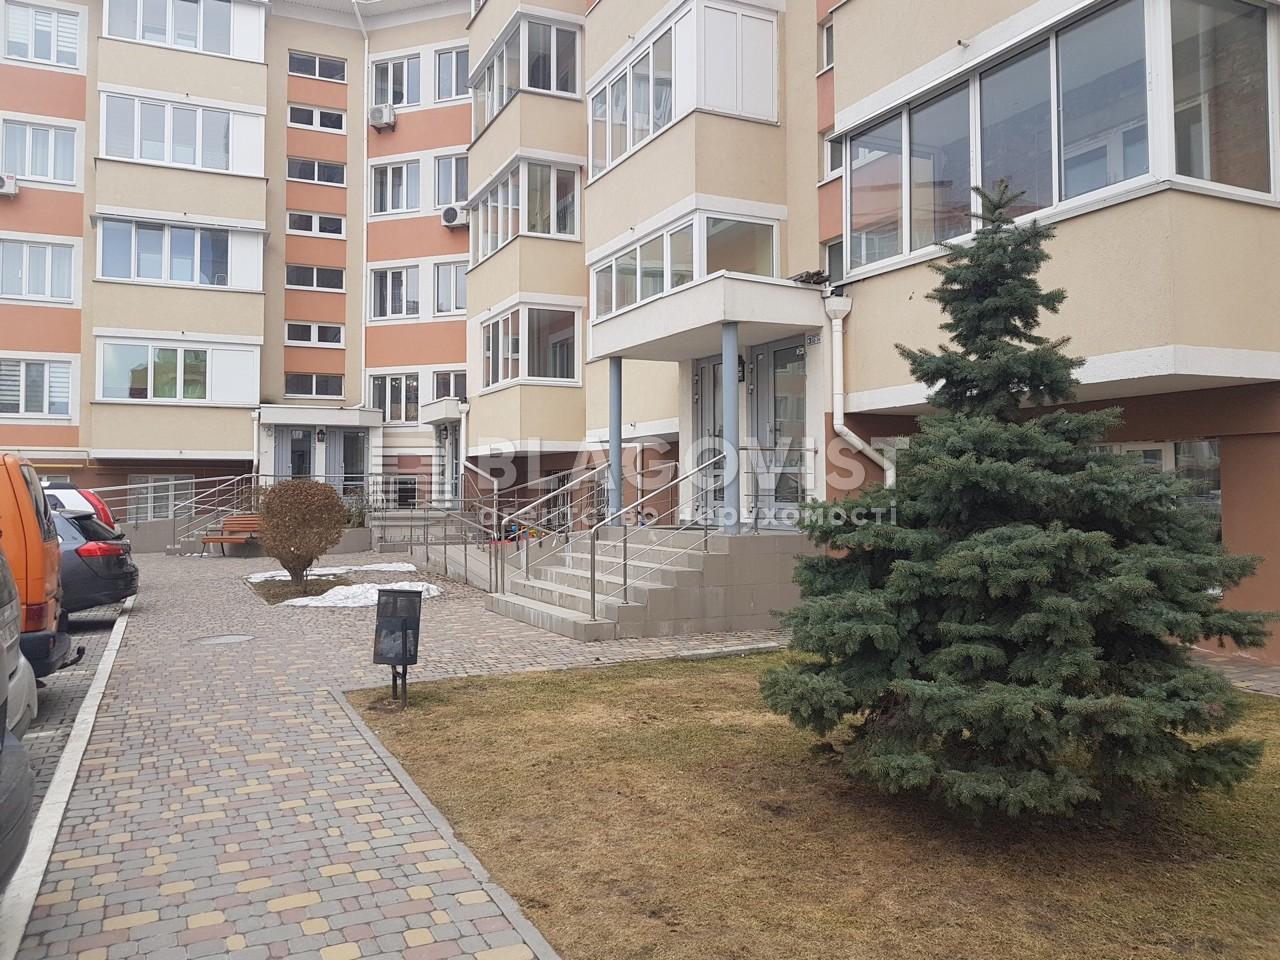 Квартира E-40784, Леси Украинки, 4, Софиевская Борщаговка - Фото 3